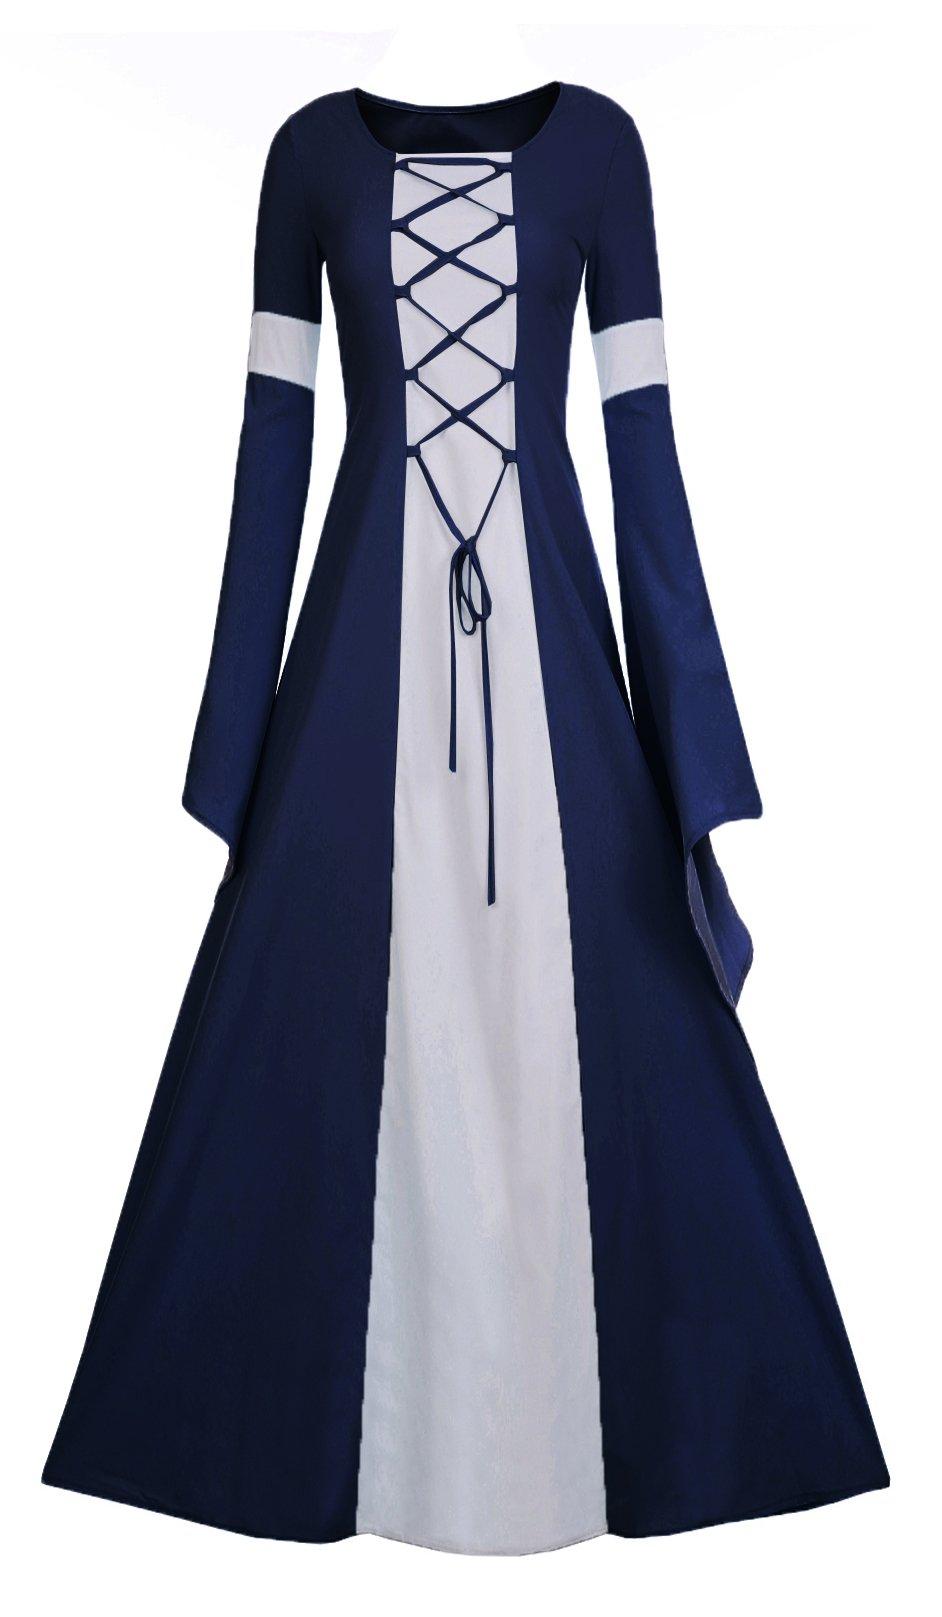 Meilidress Women Medieval Dress Lace up Vintage Floor Length Cosplay Retro Long Dress (Medium, Navy Blue)